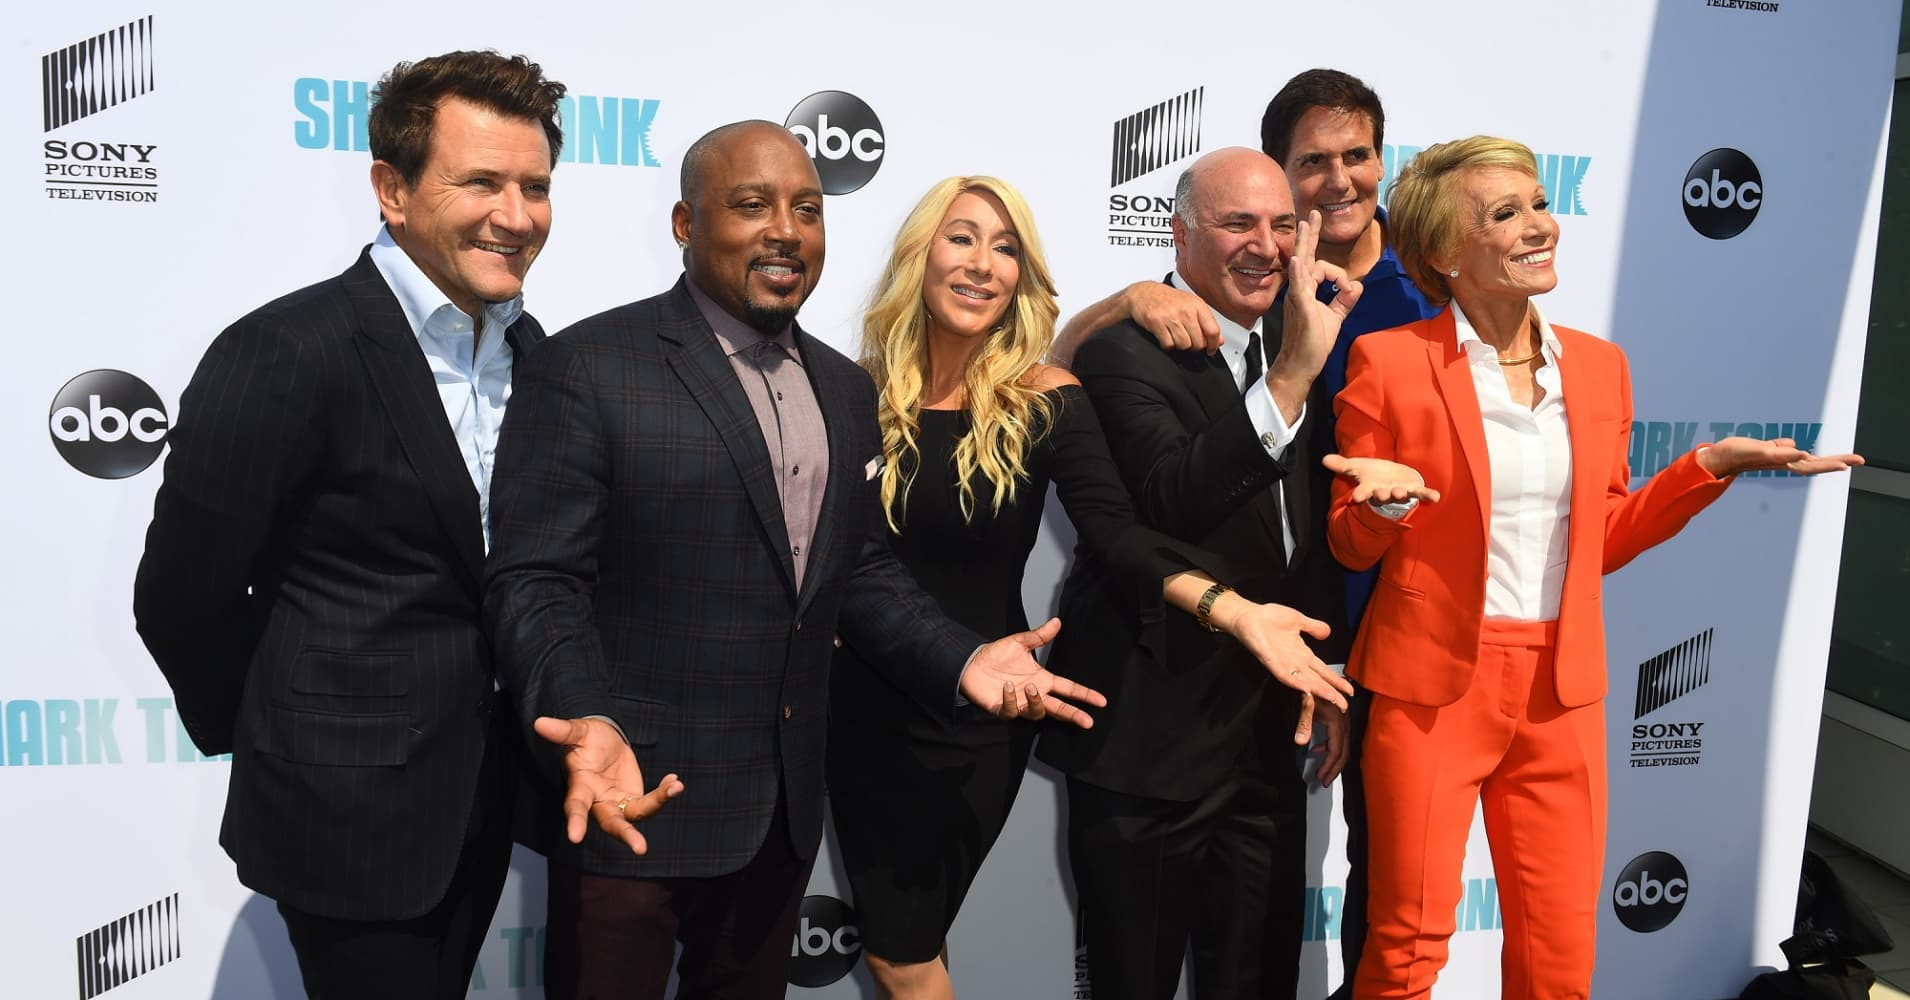 """Shark Tank"" stars Robert Herjavec, Daymond John, Lori Greiner, Kevin O'Leary, Mark Cuban, Babara Corcoran"